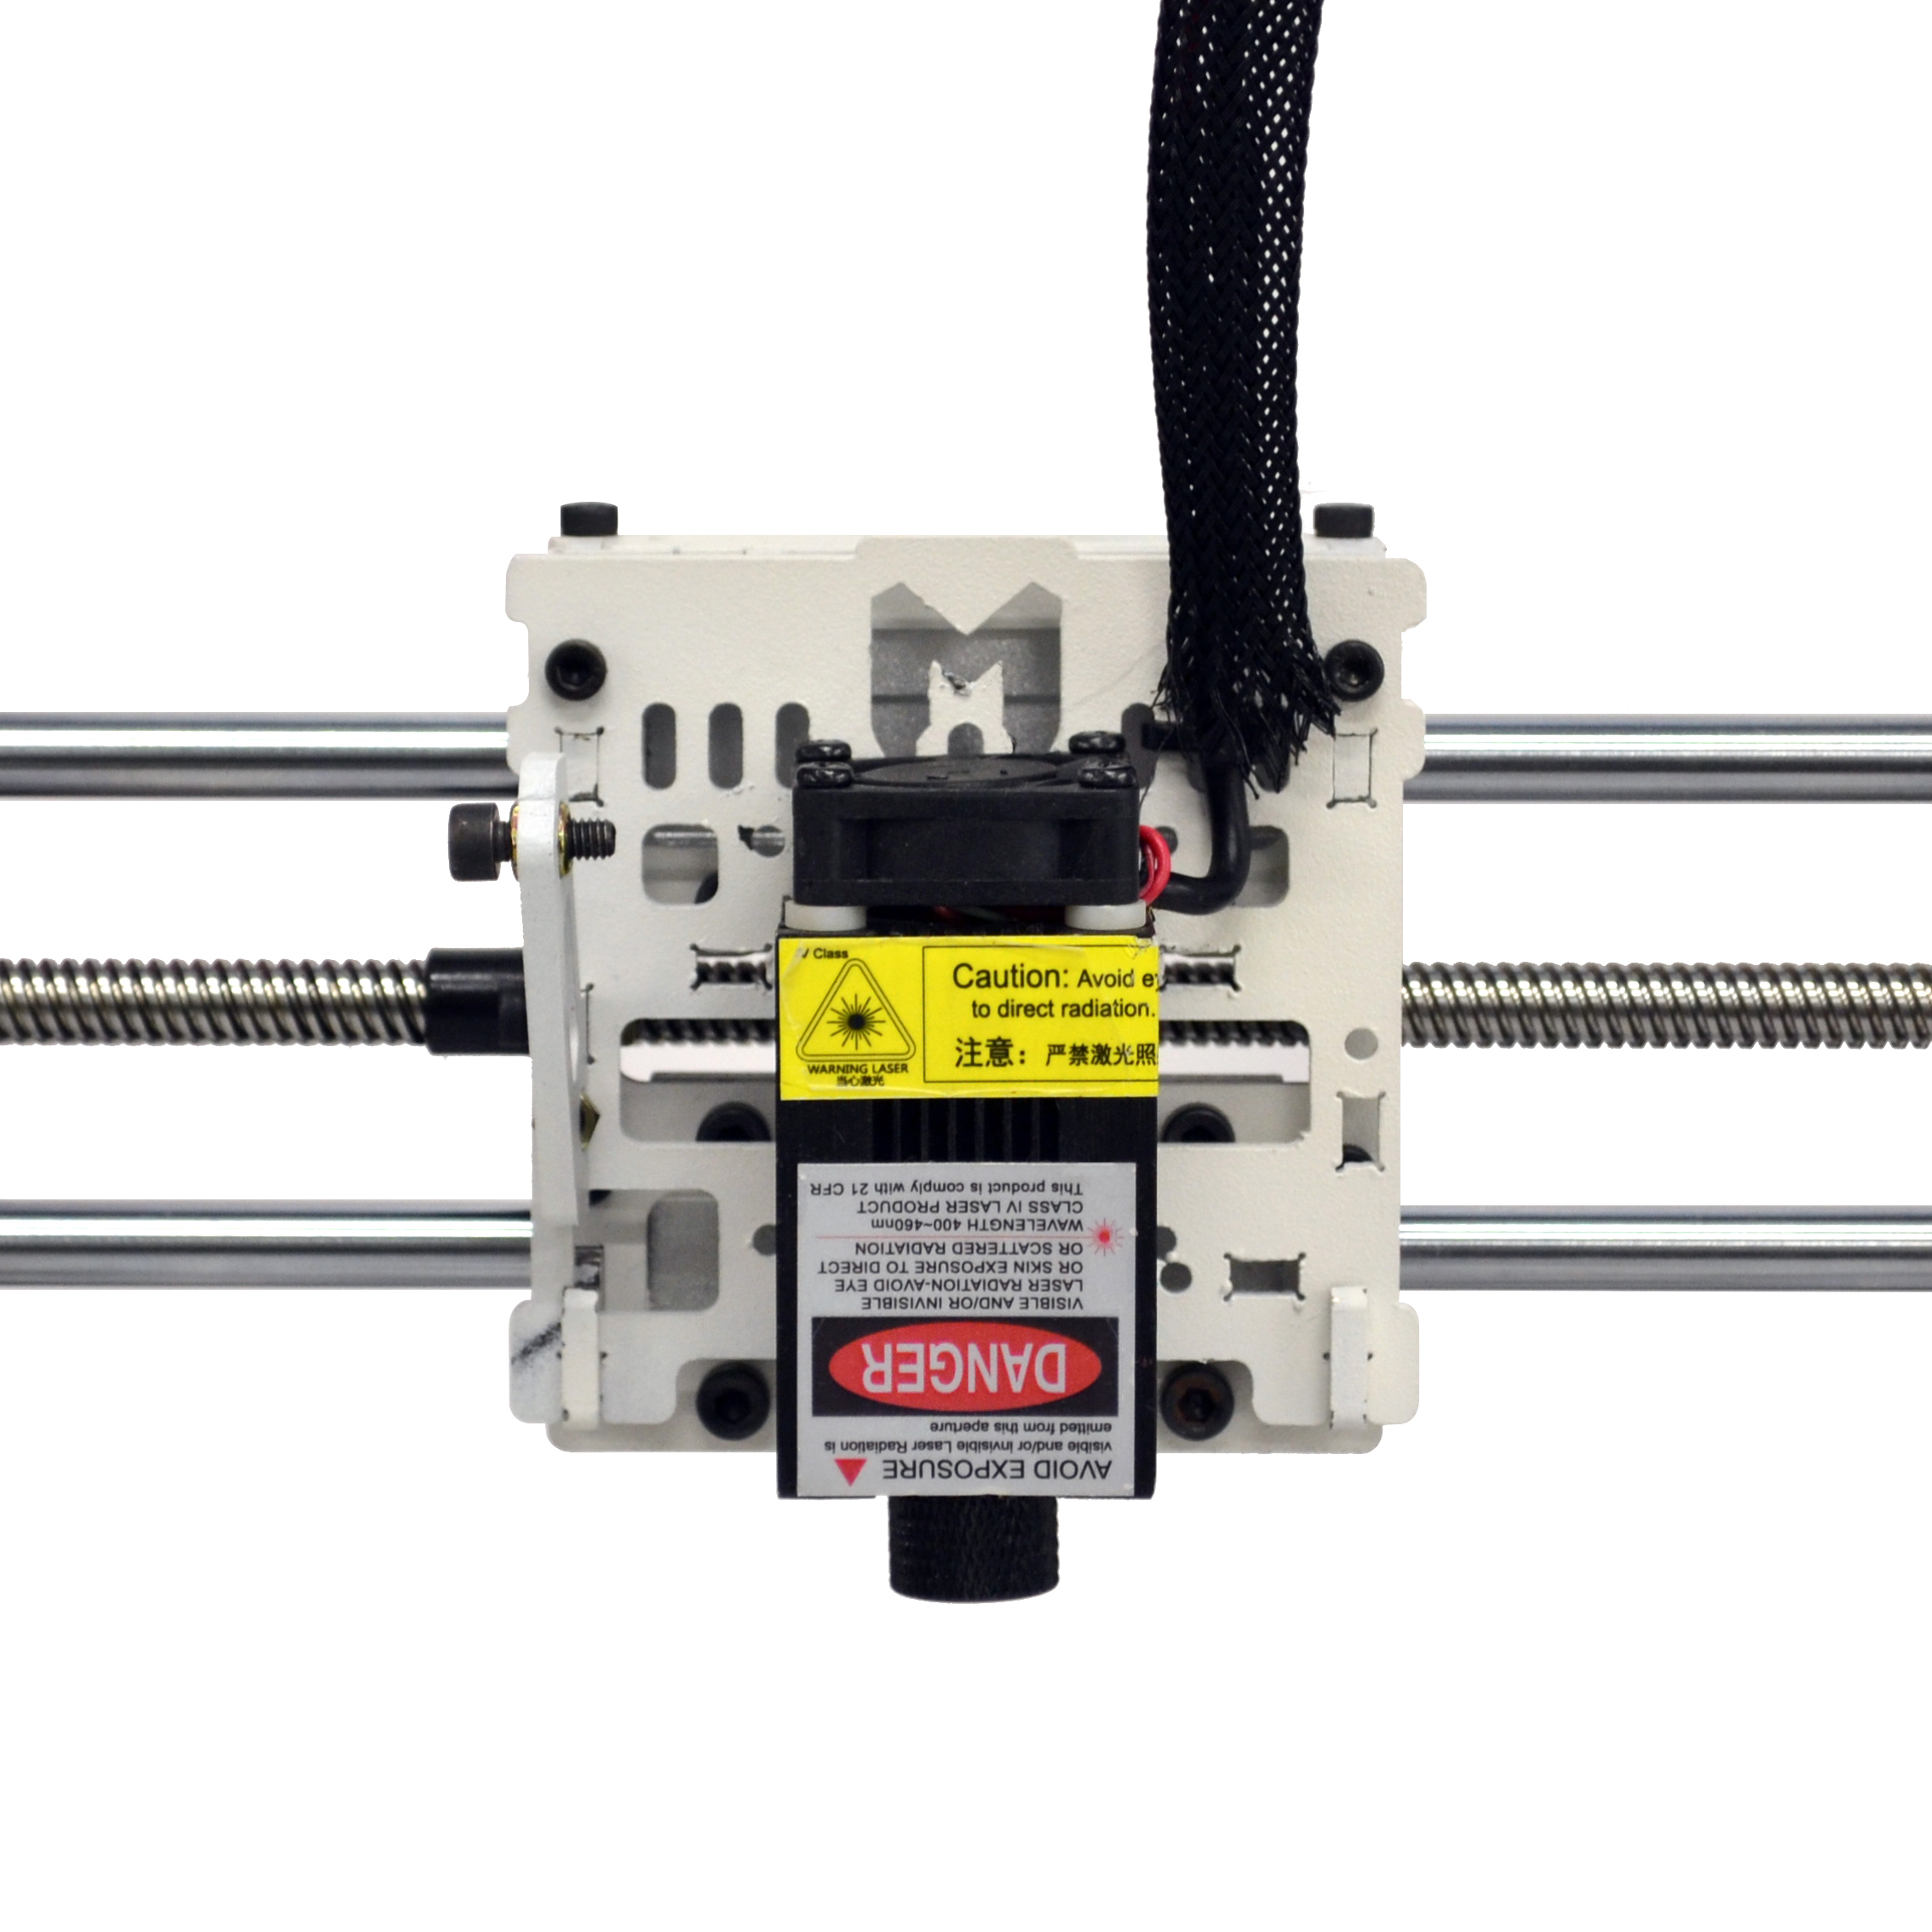 30990-.jpg Download free STL file Prusa I3 Steel V2 Makerparts - Laser Cut • Template to 3D print, Agos3D